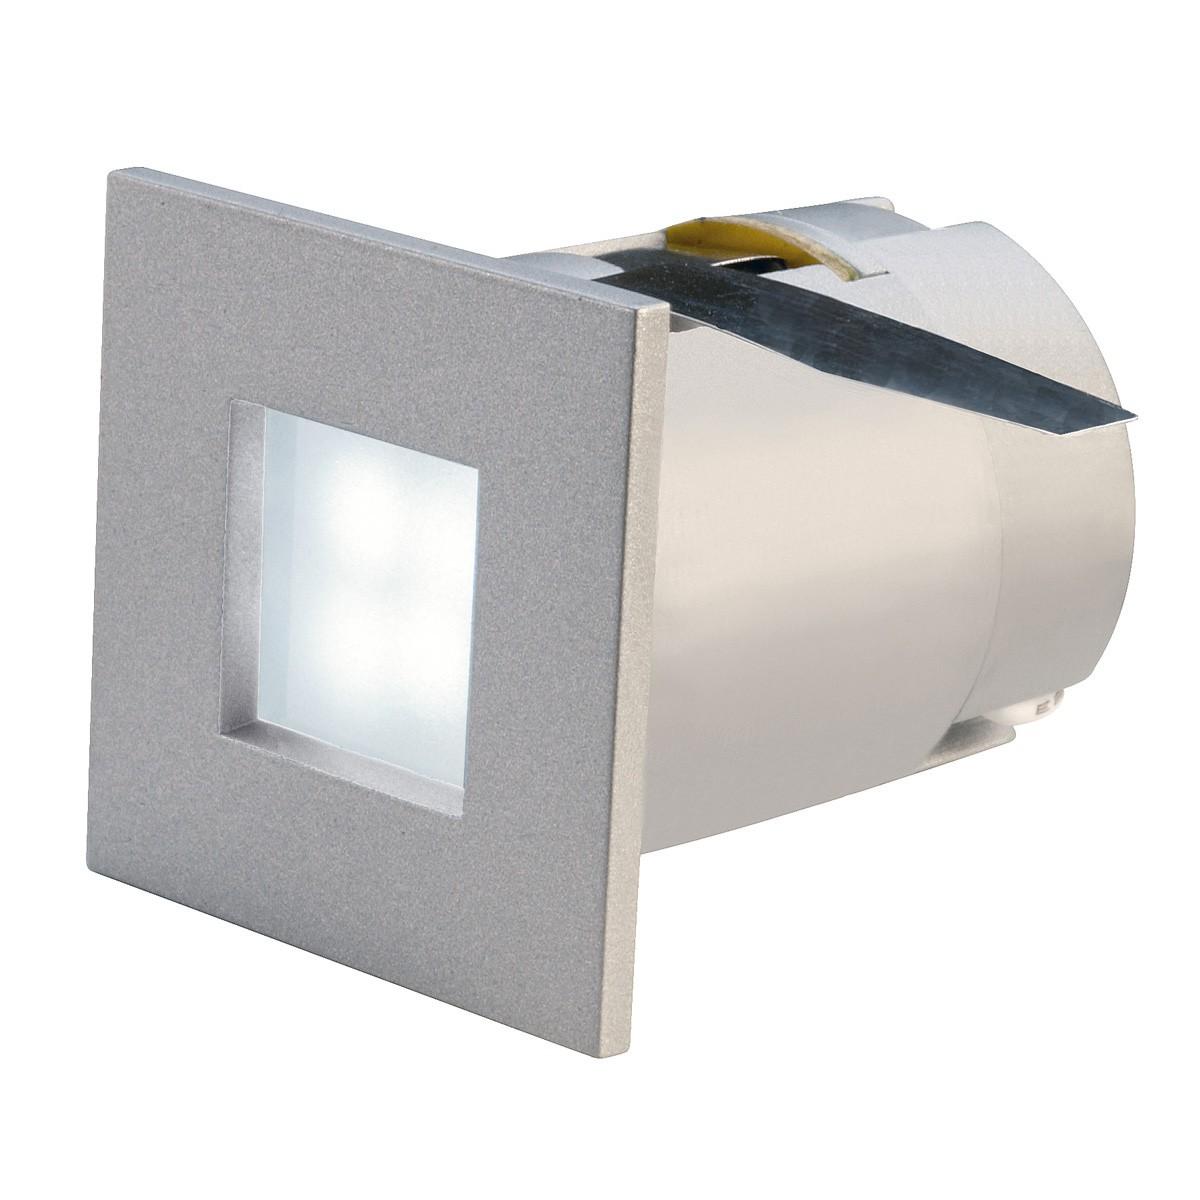 mini frame led einbaustrahler eckig silbergrau 0 3w 4. Black Bedroom Furniture Sets. Home Design Ideas